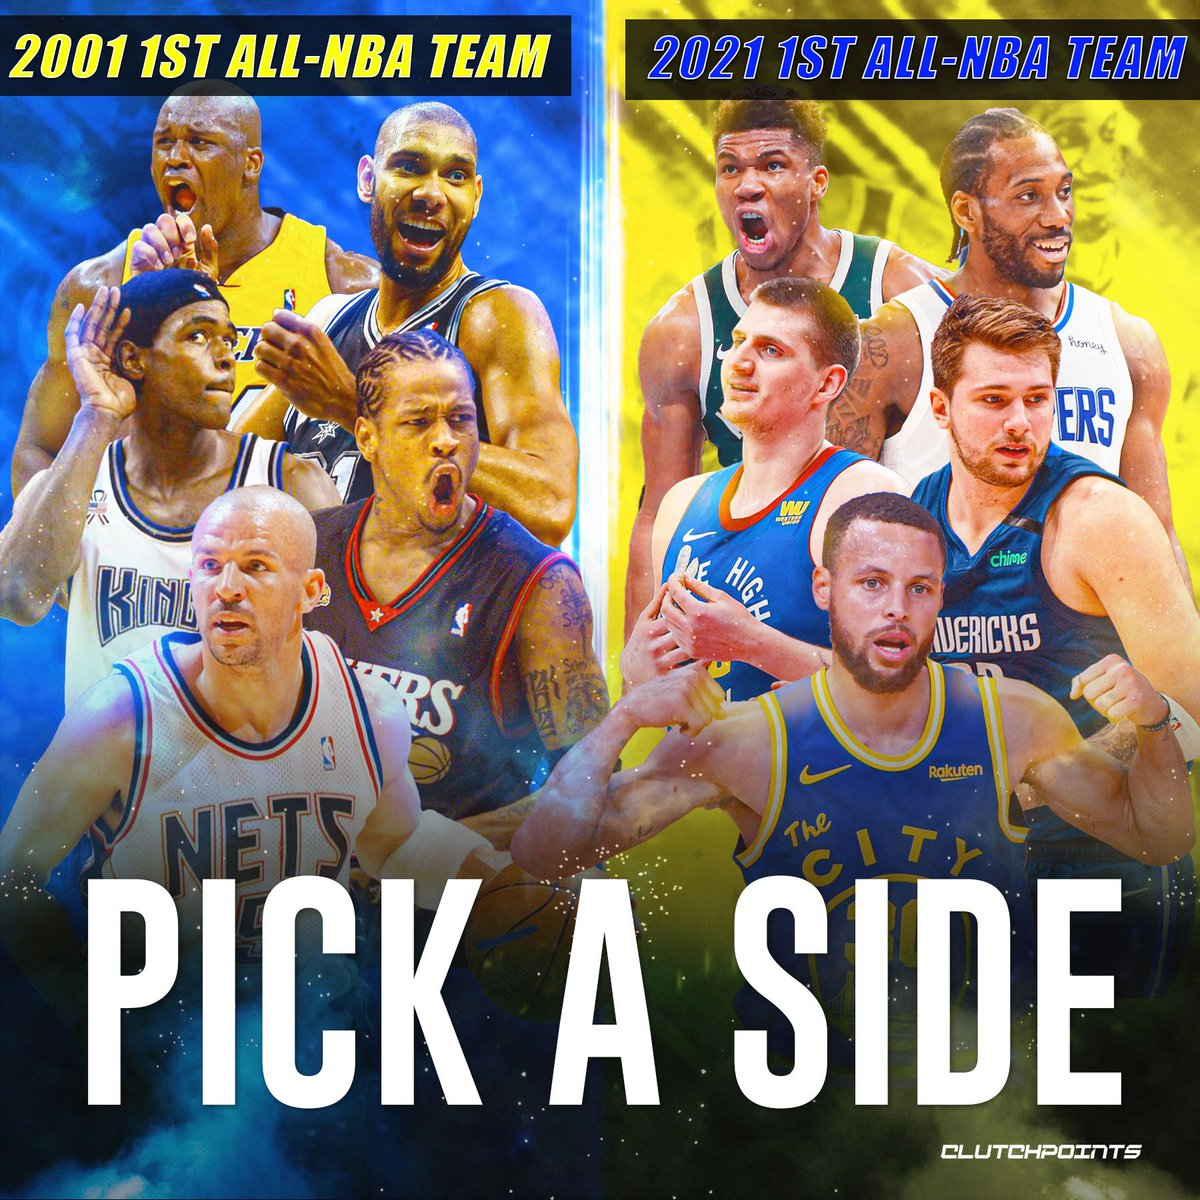 Two NBA top fives, 20 years apart. Who you got? 🔥 👉 2001: Jason Kidd, Allen Iverson, Chris Webber, Tim Duncan, Shaquille O'Neal 👉 2021: Stephen Curry, Luka Doncic, Kawhi Leonard, Giannis Antetokounmpo, Nikola Jokic